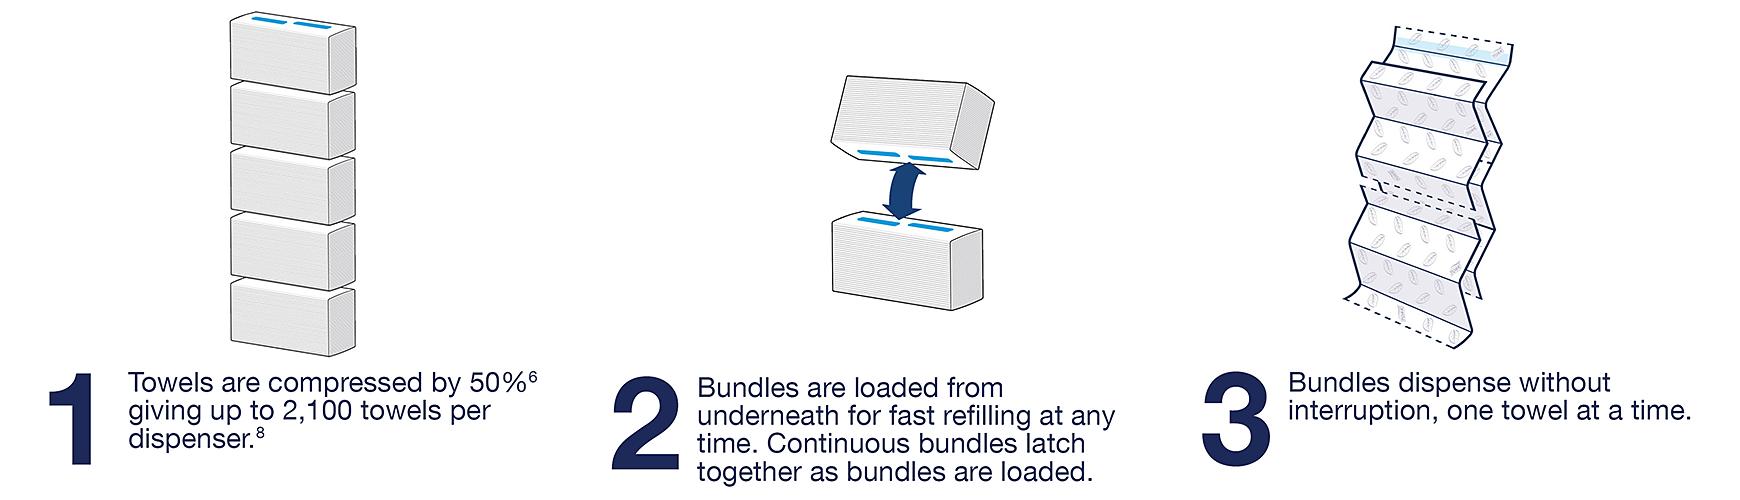 Tork PeakServe bundles dispense without interruption, one towel at a time